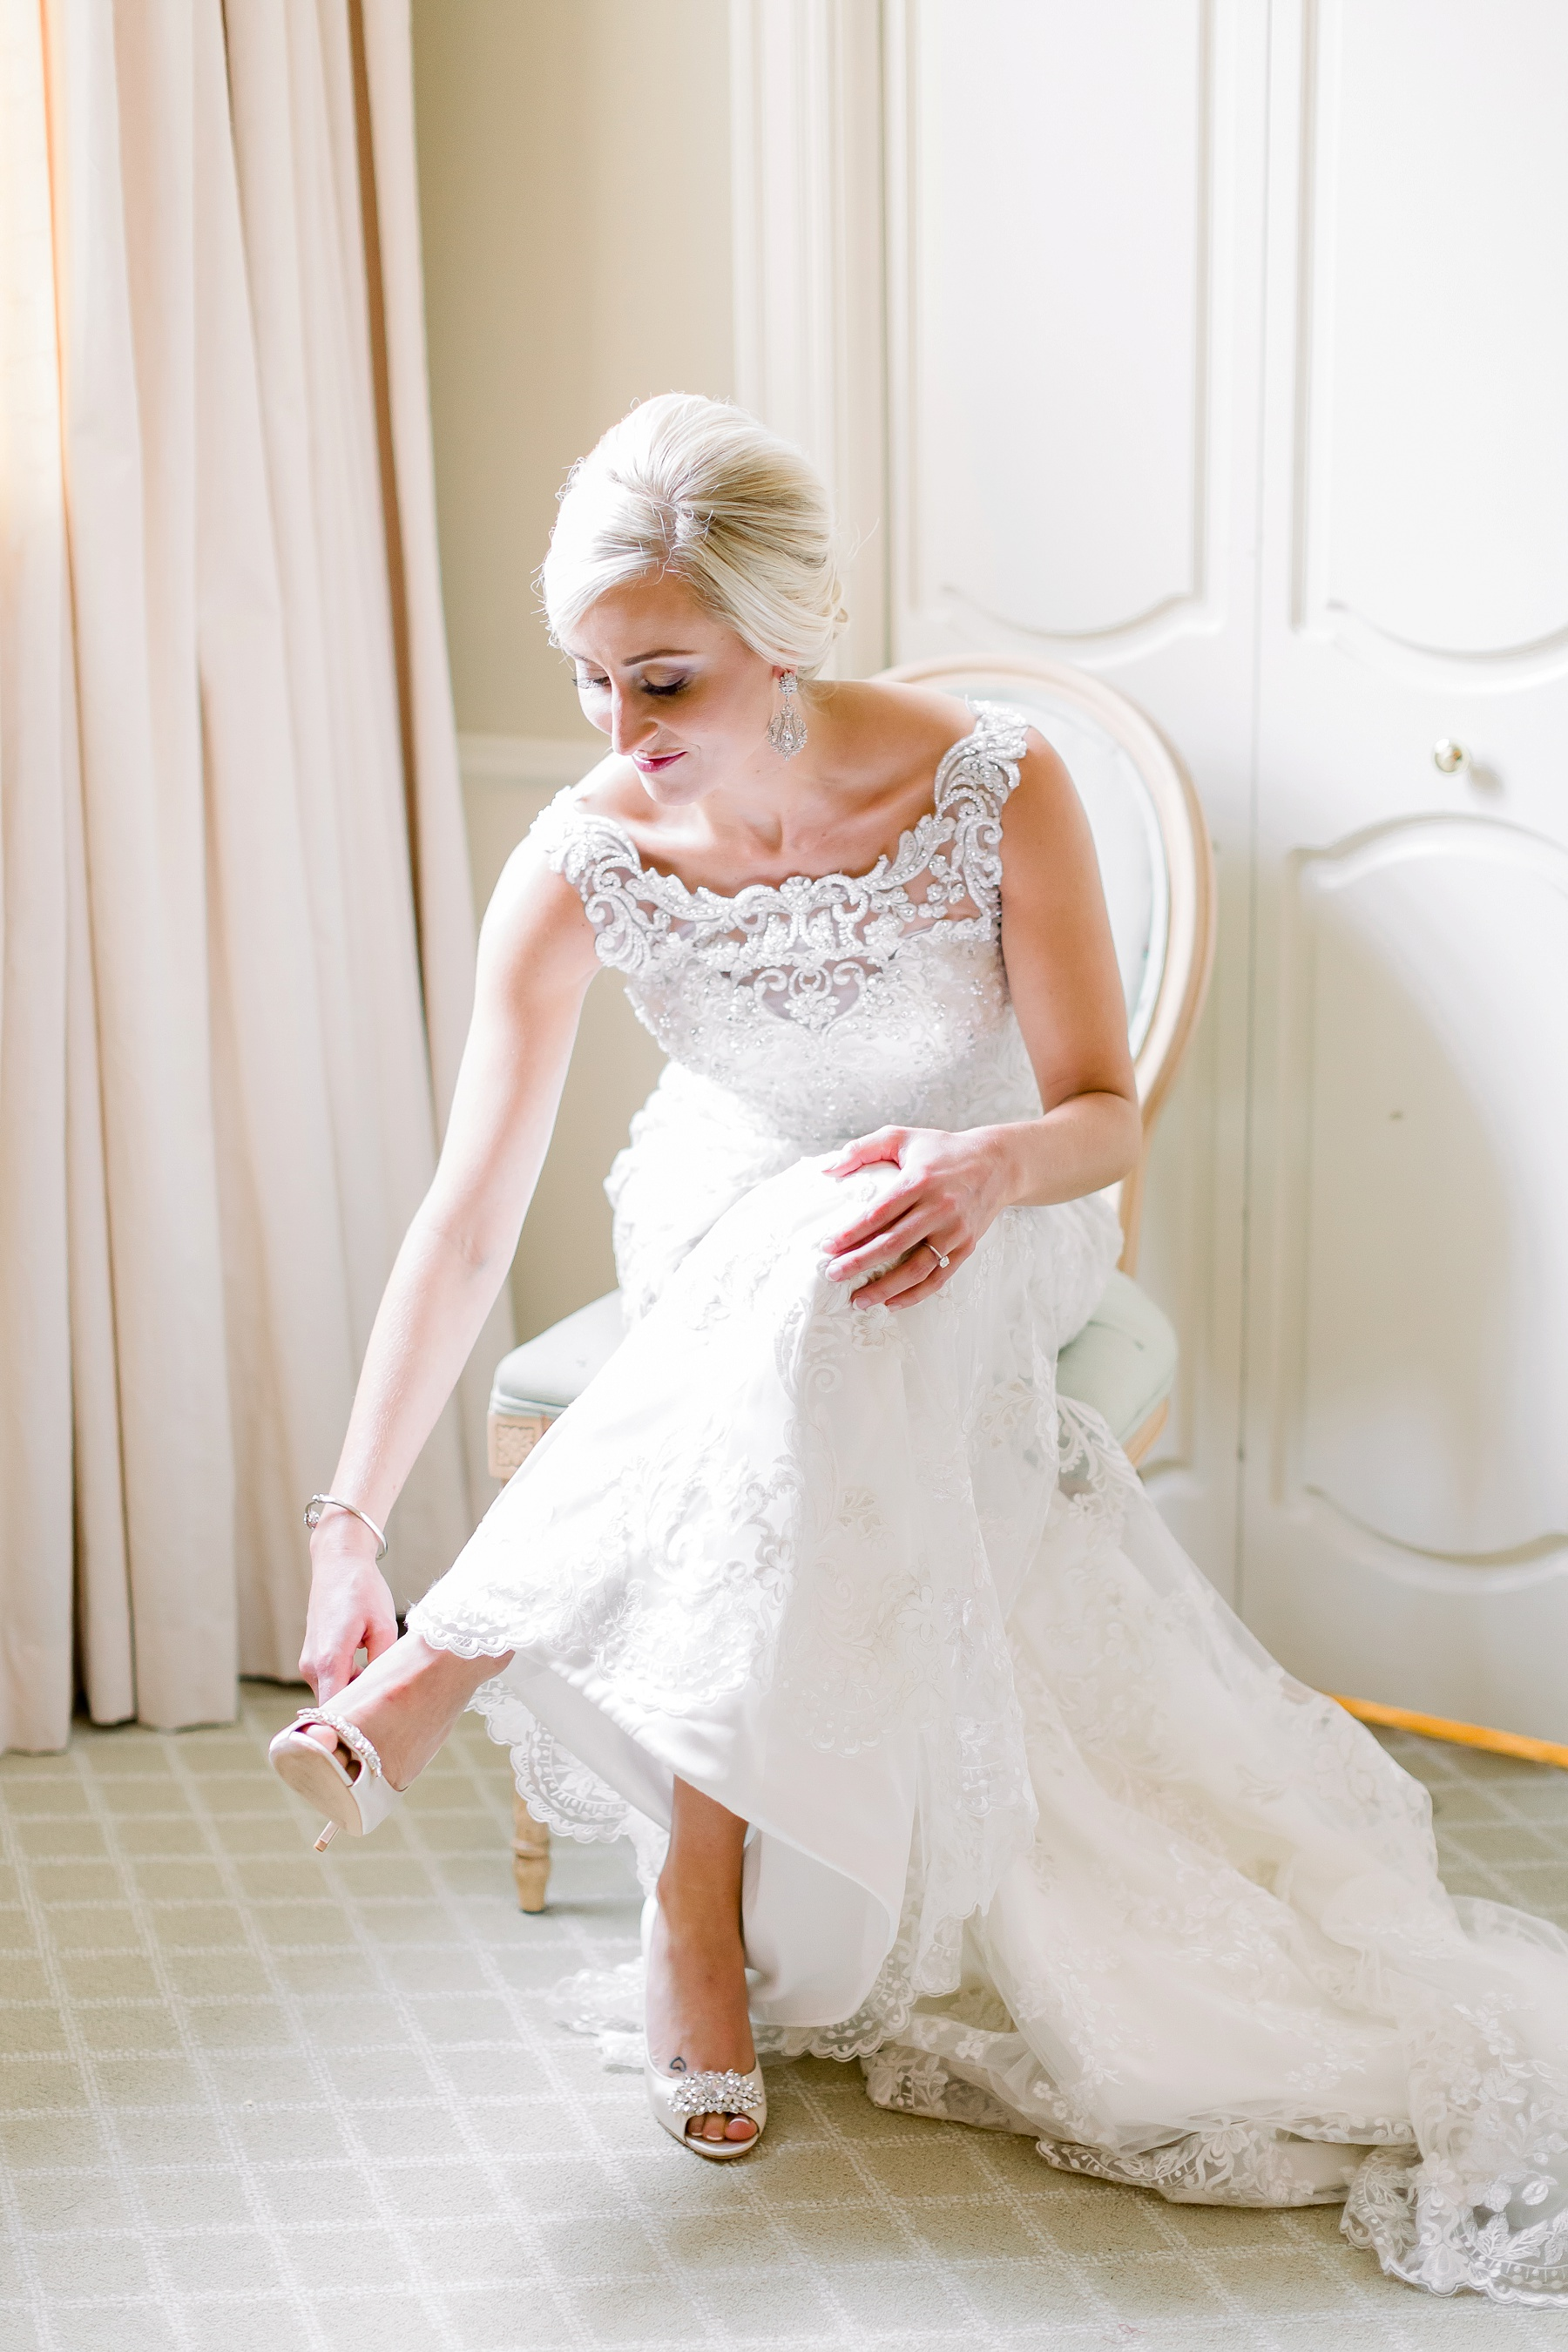 midwest-adventurous-wedding-photographer-elizabeth-ladean-photography-photo_4700.jpg